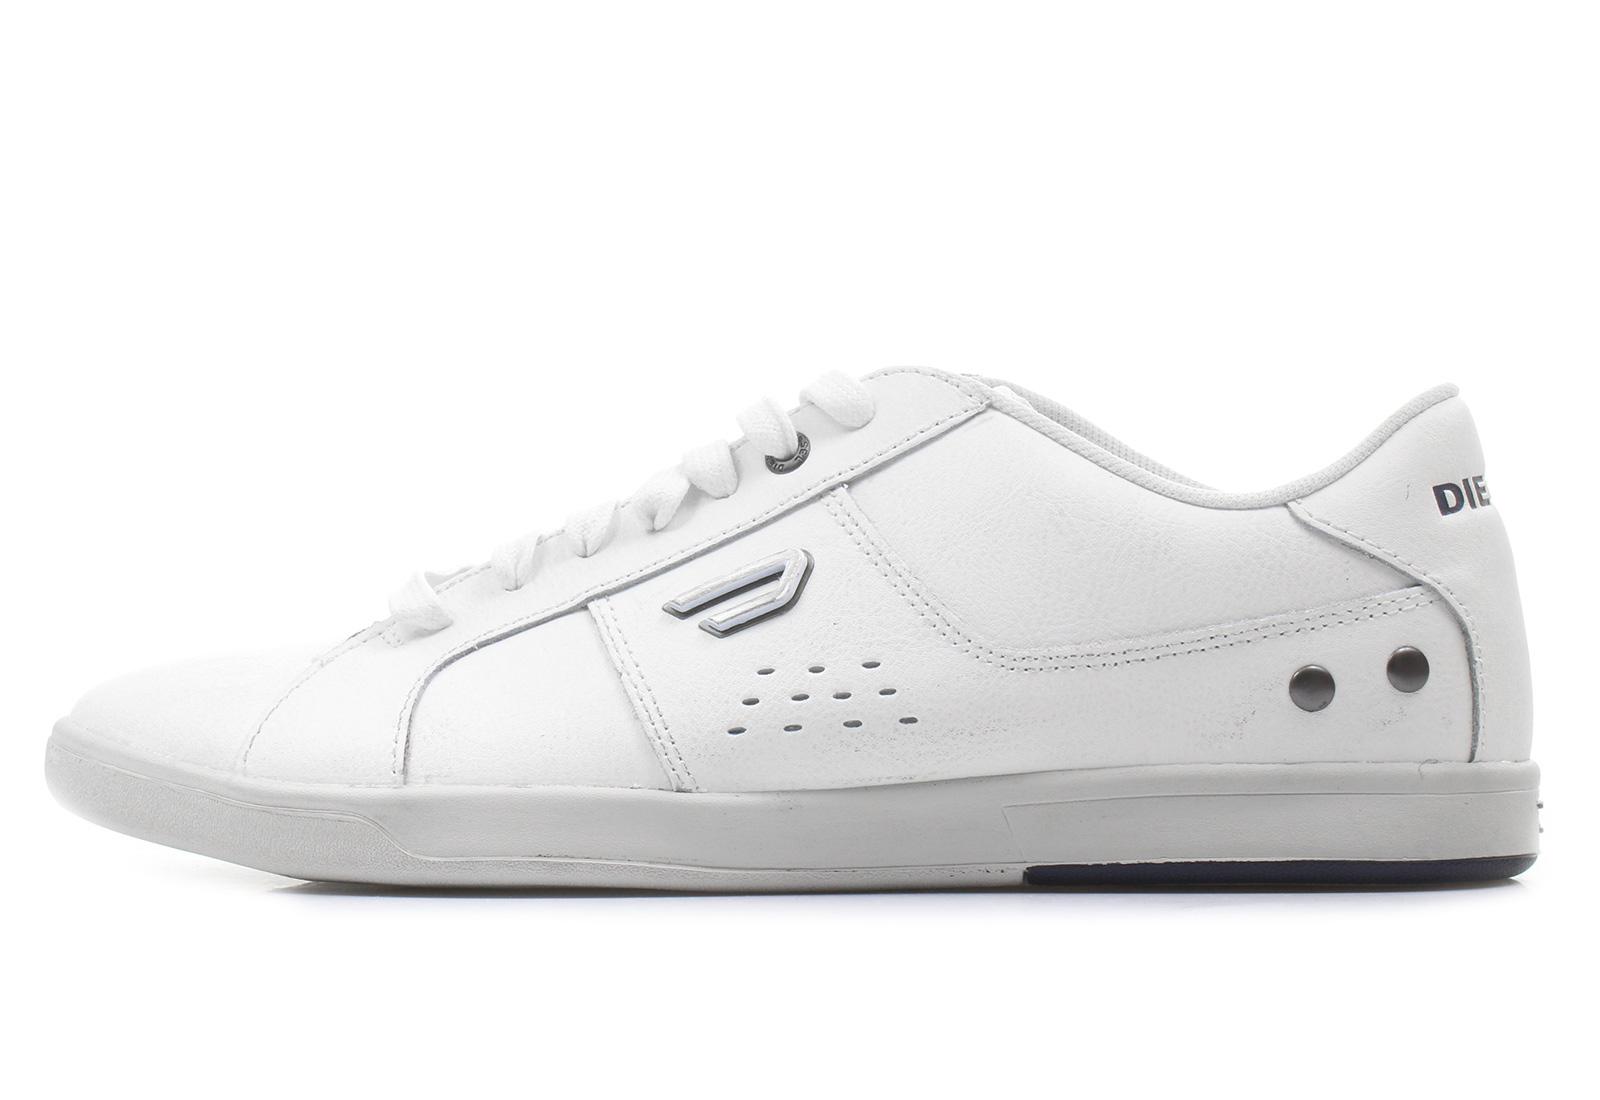 Diesel Shoes - Gotcha - 985-371-1003 - Online shop for ...